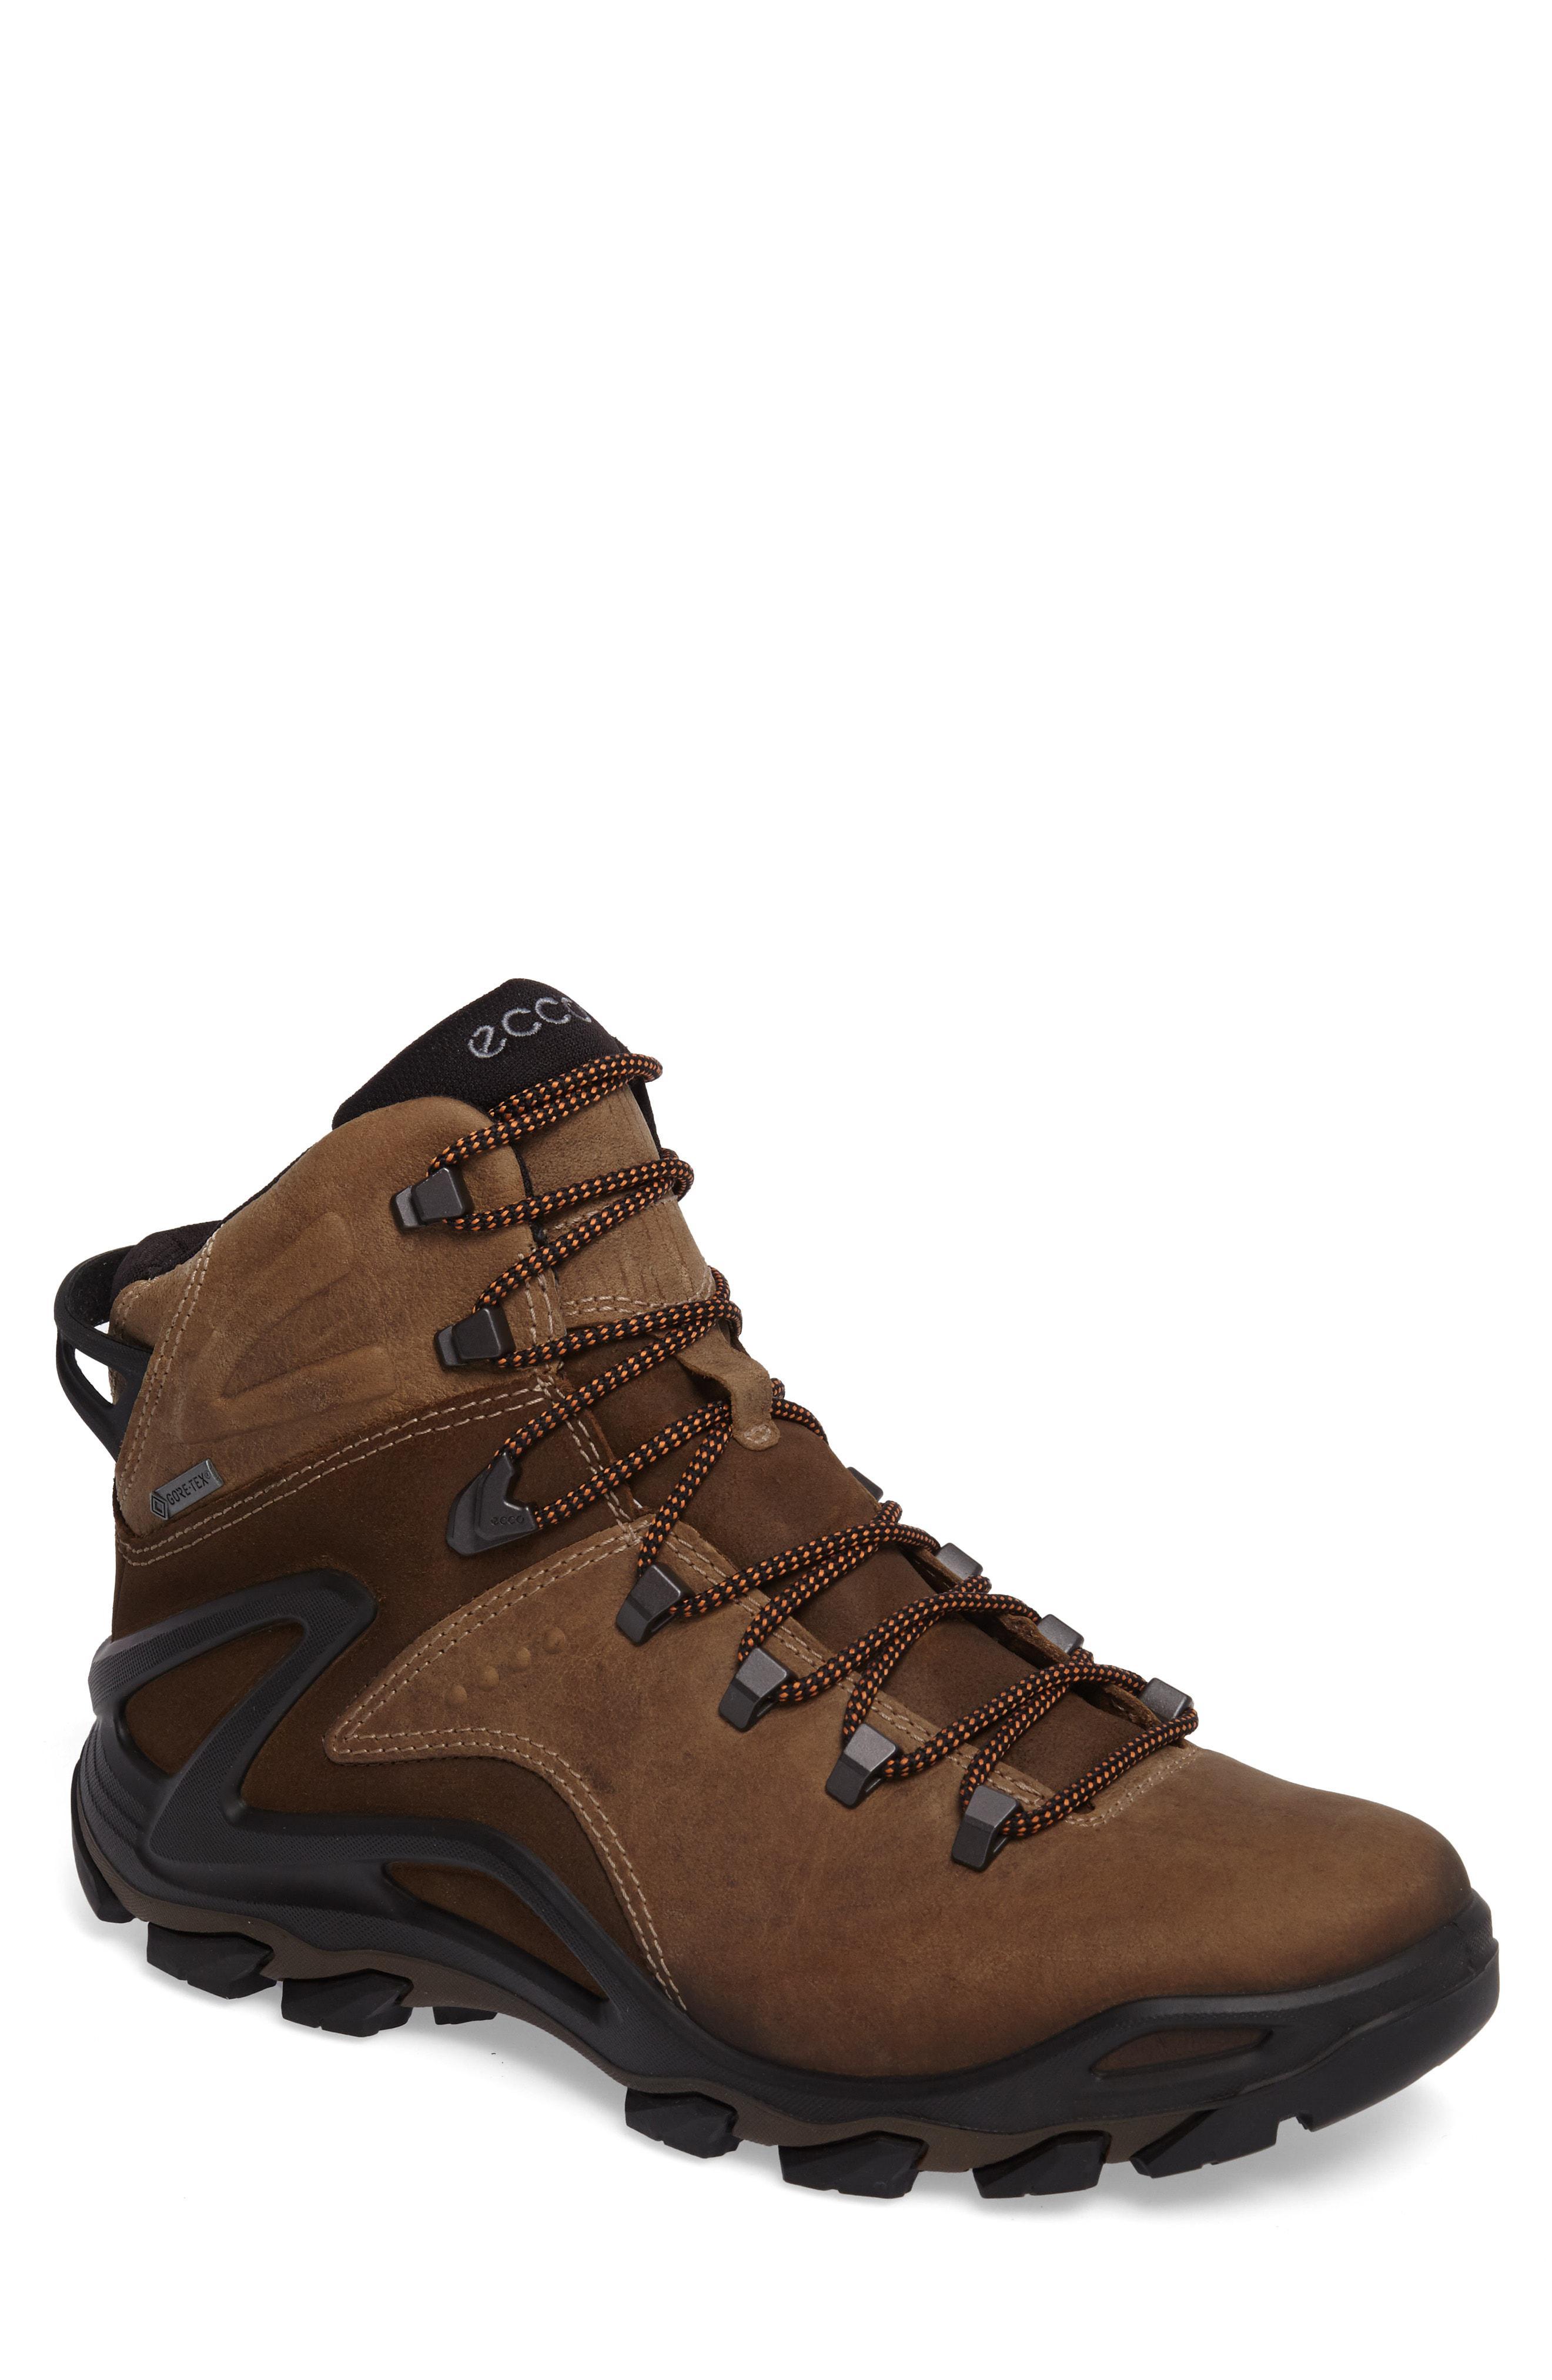 d7f89ed0d0 Lyst - Ecco Terra Evo Gtx Mid Hiking Waterproof Boot in Metallic for Men